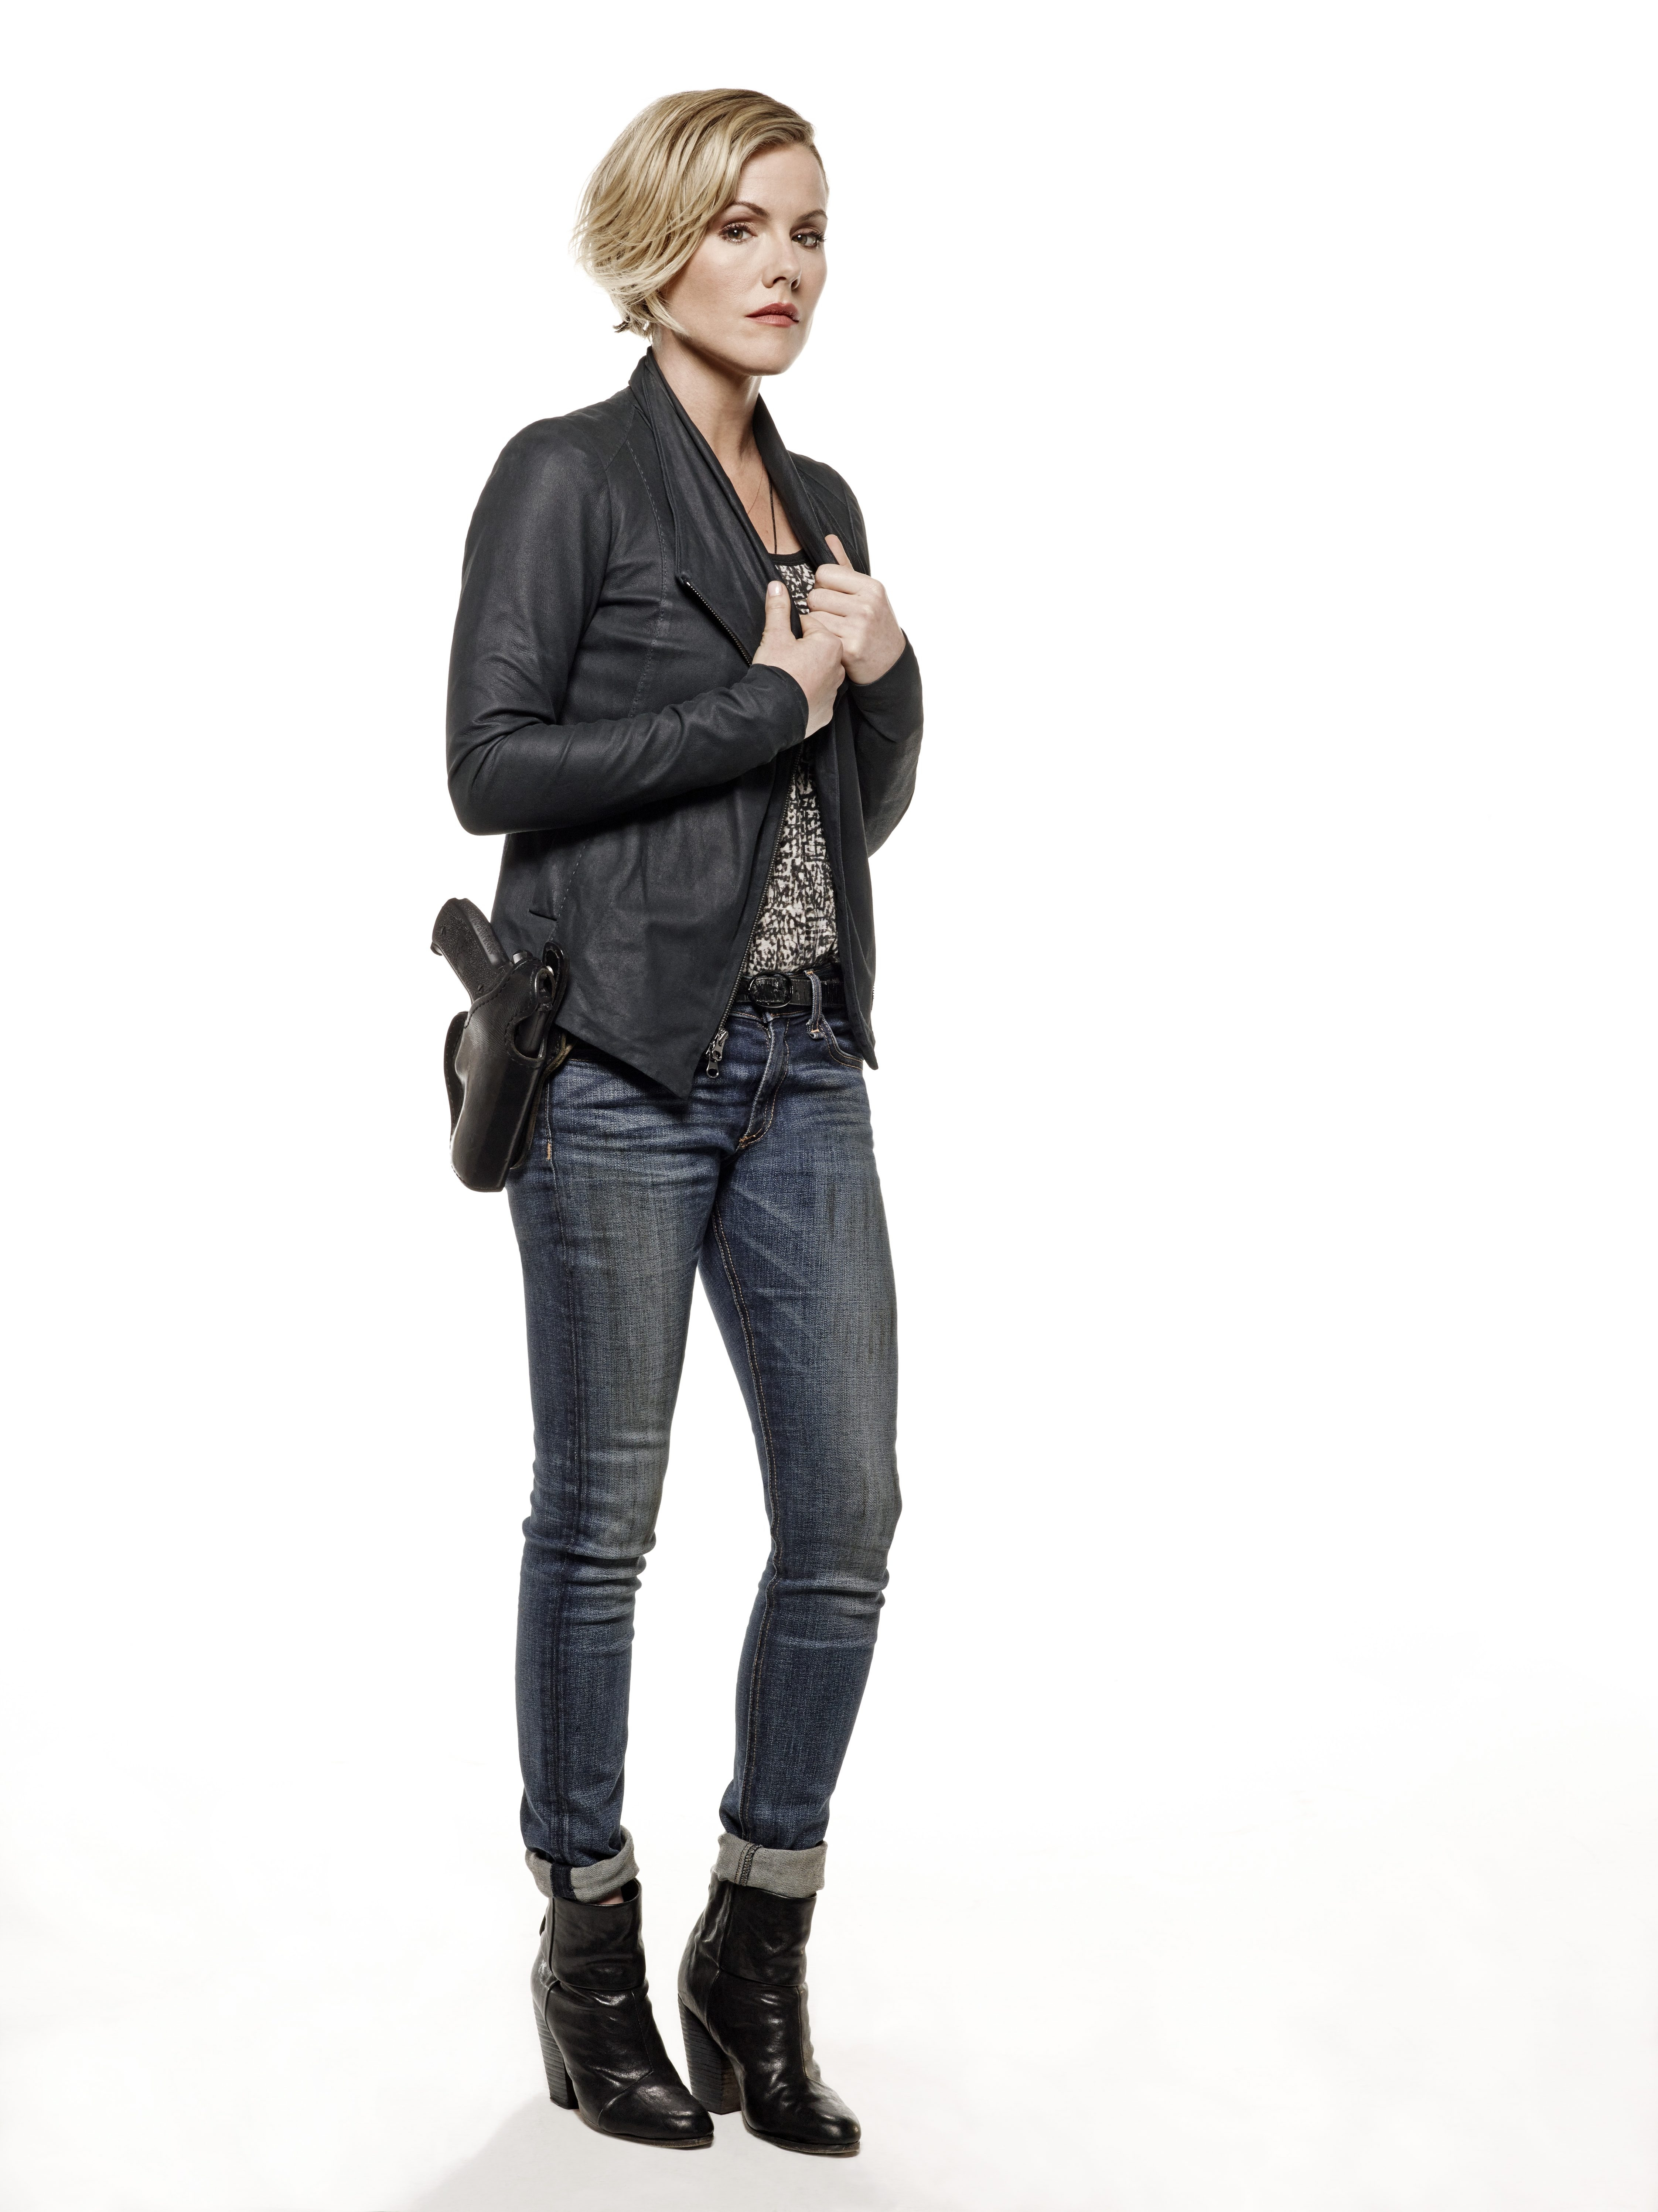 Kathleen Robertson, of 'Beverly Hills 90210' fame, plays detective Hildy Mulligan.